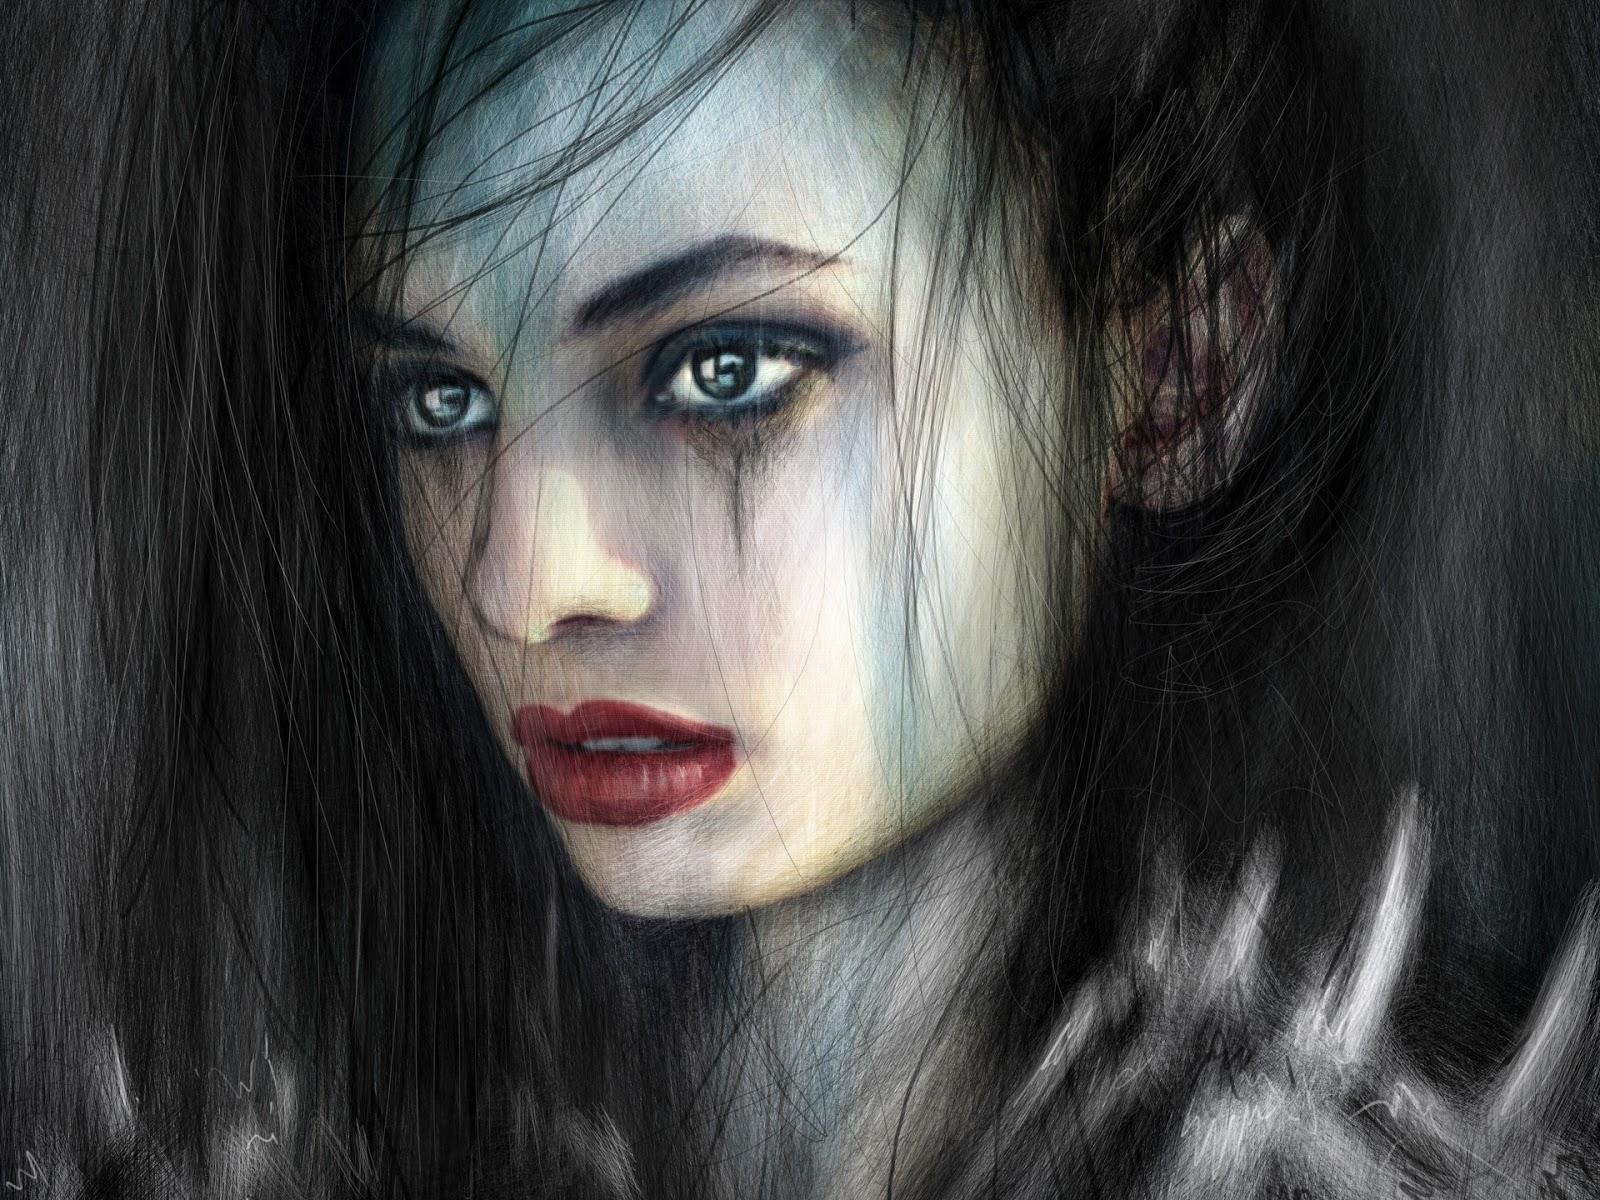 Gothic fantasy portrait painting by Justin Gedak